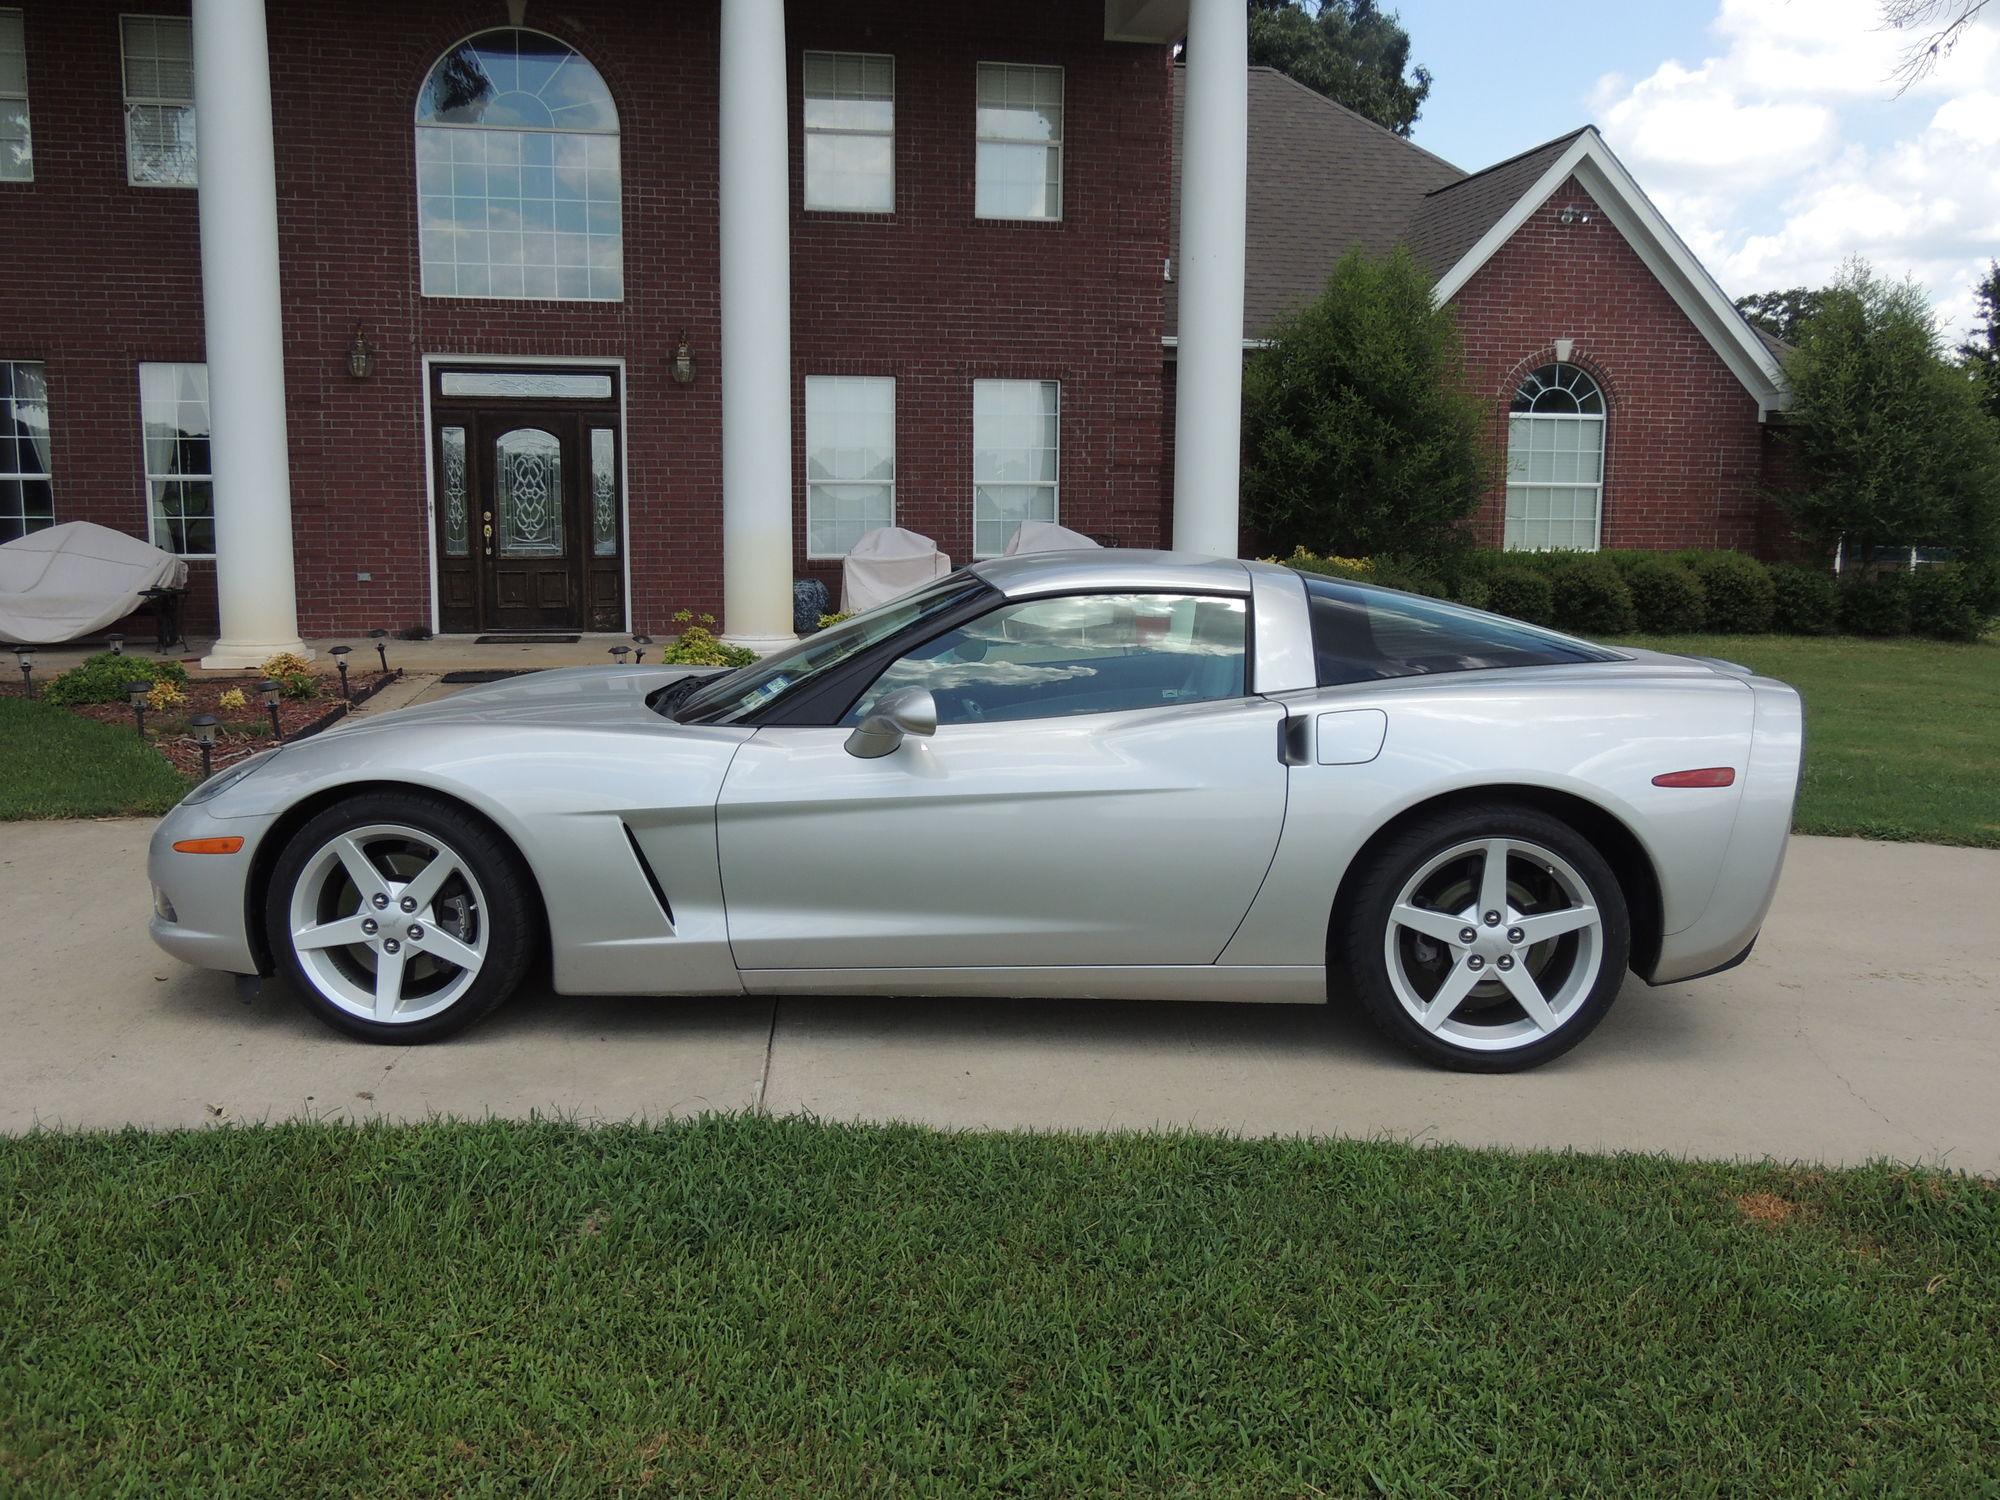 2005 C6 Corvette for sale Mint Condition and 14 893 miles